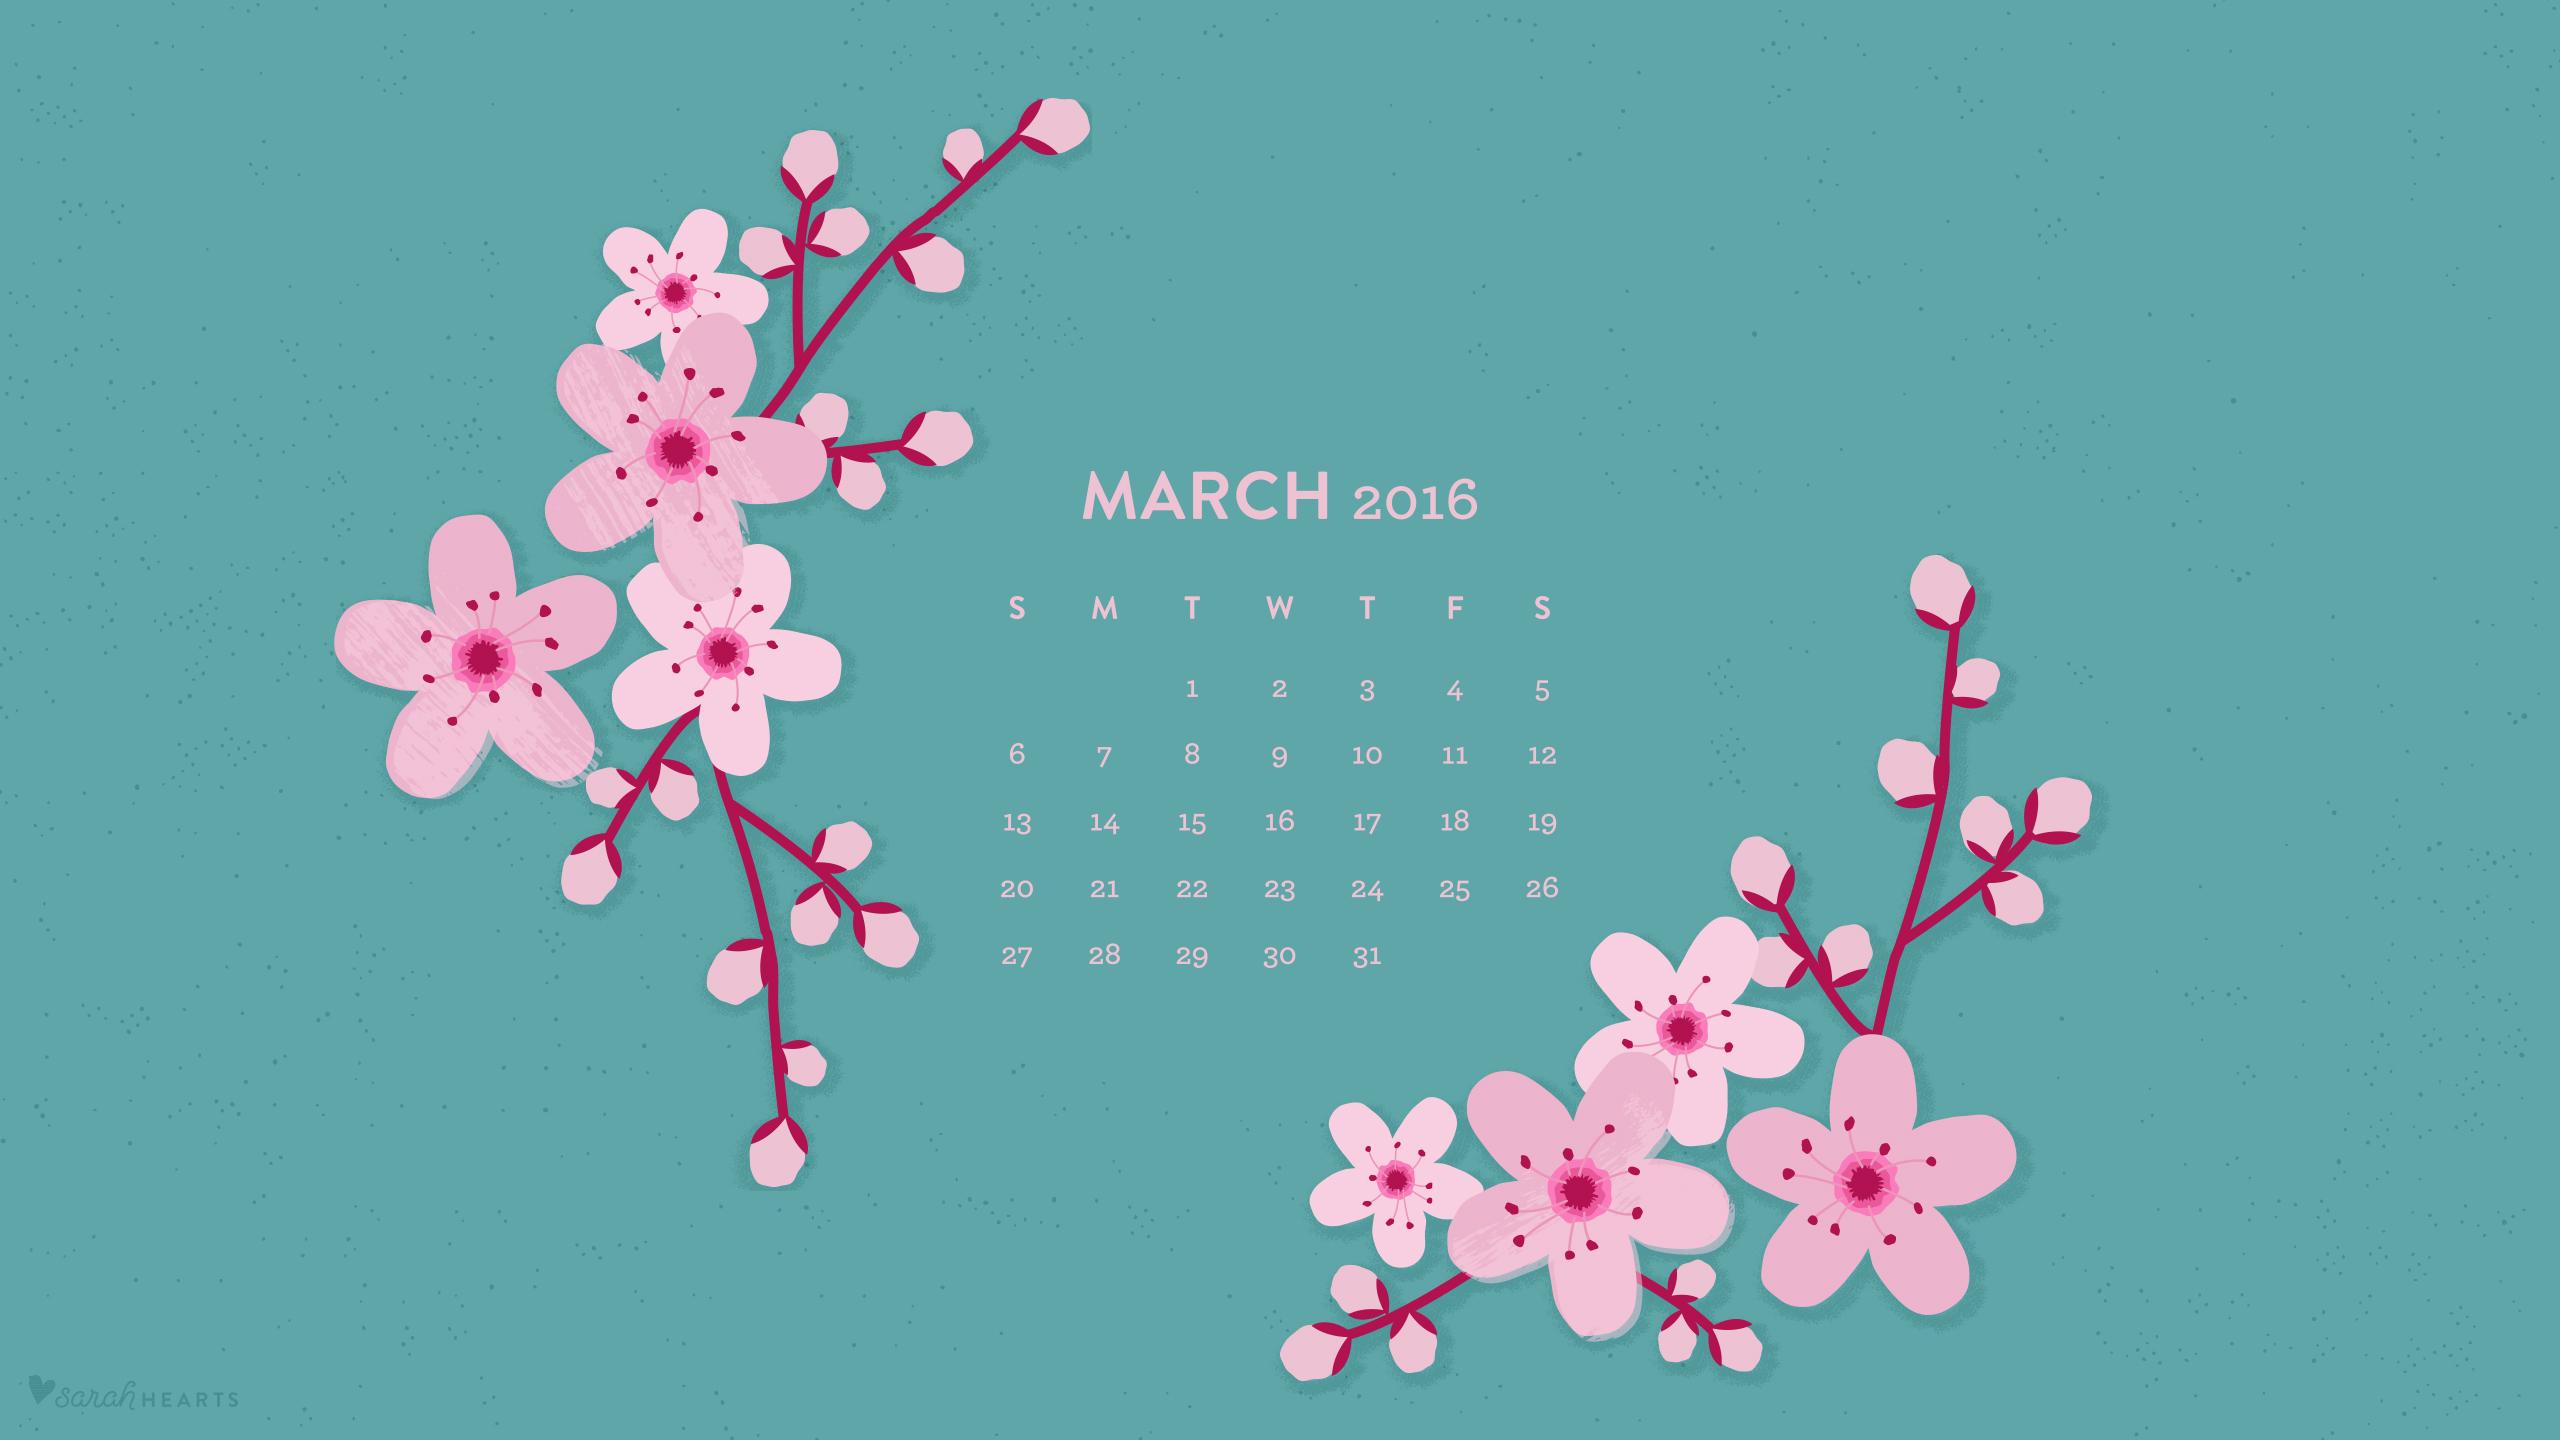 March 2016 Cherry Blossom Calendar Wallpaper   Sarah Hearts 2560x1440